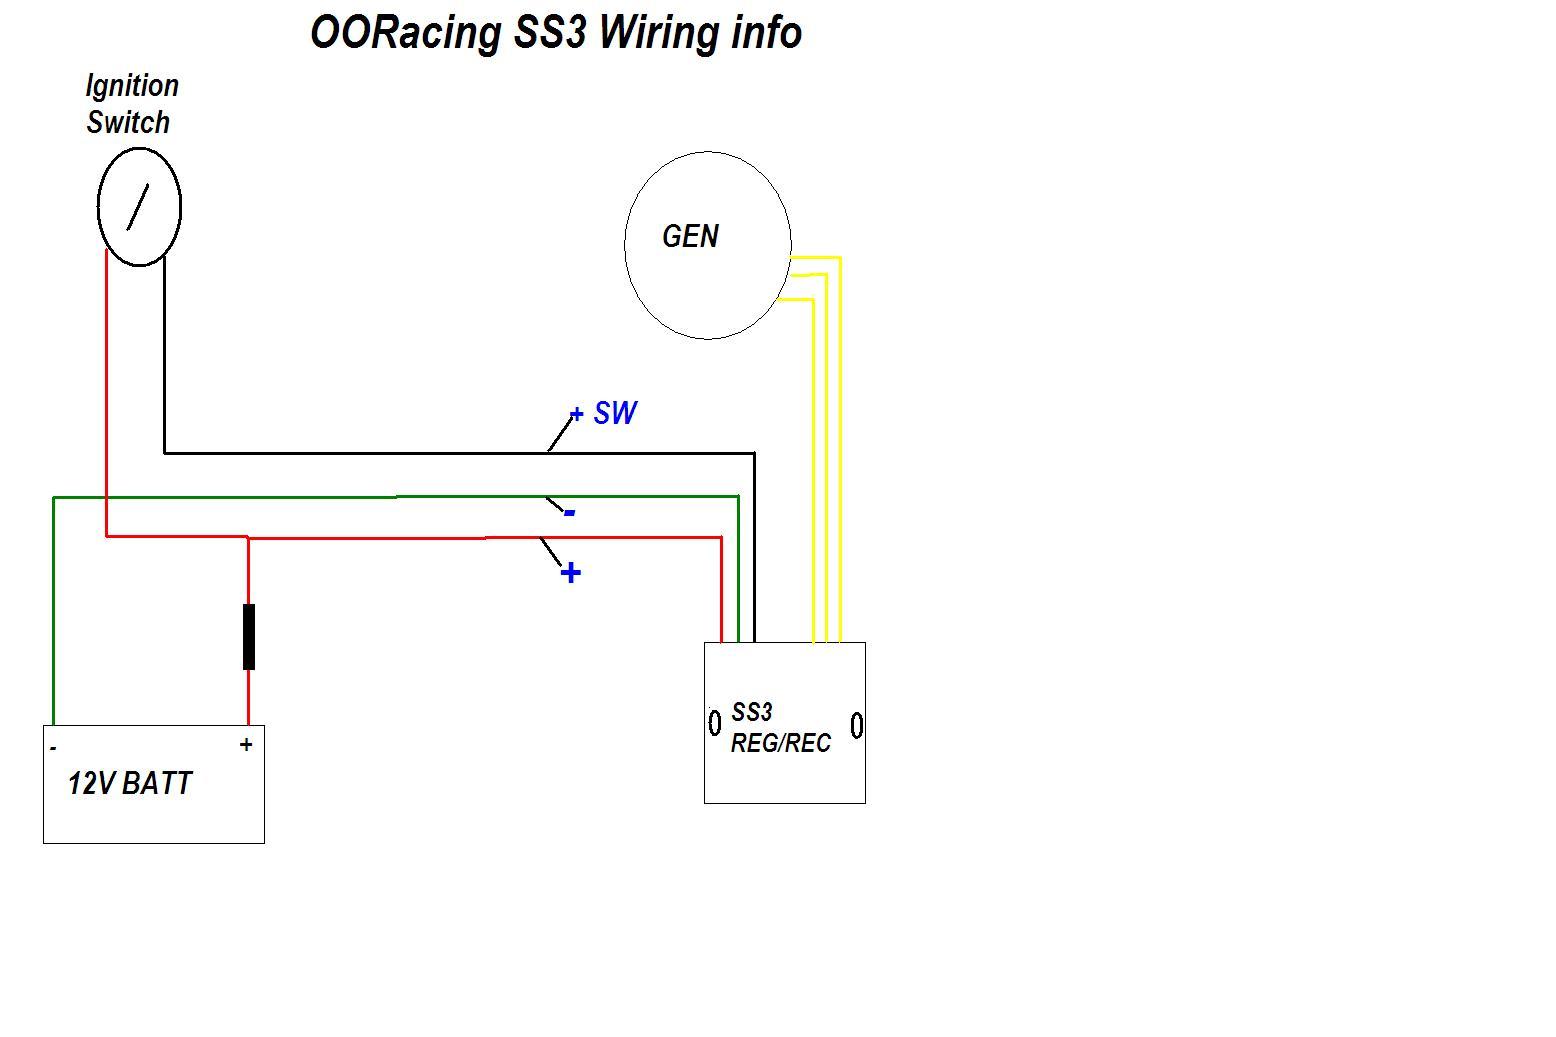 SS3_Gen_wiring?resize=640%2C427&ssl=1 pit bike wiring diagram kick start hobbiesxstyle wiring diagram for electric start pit bike at creativeand.co